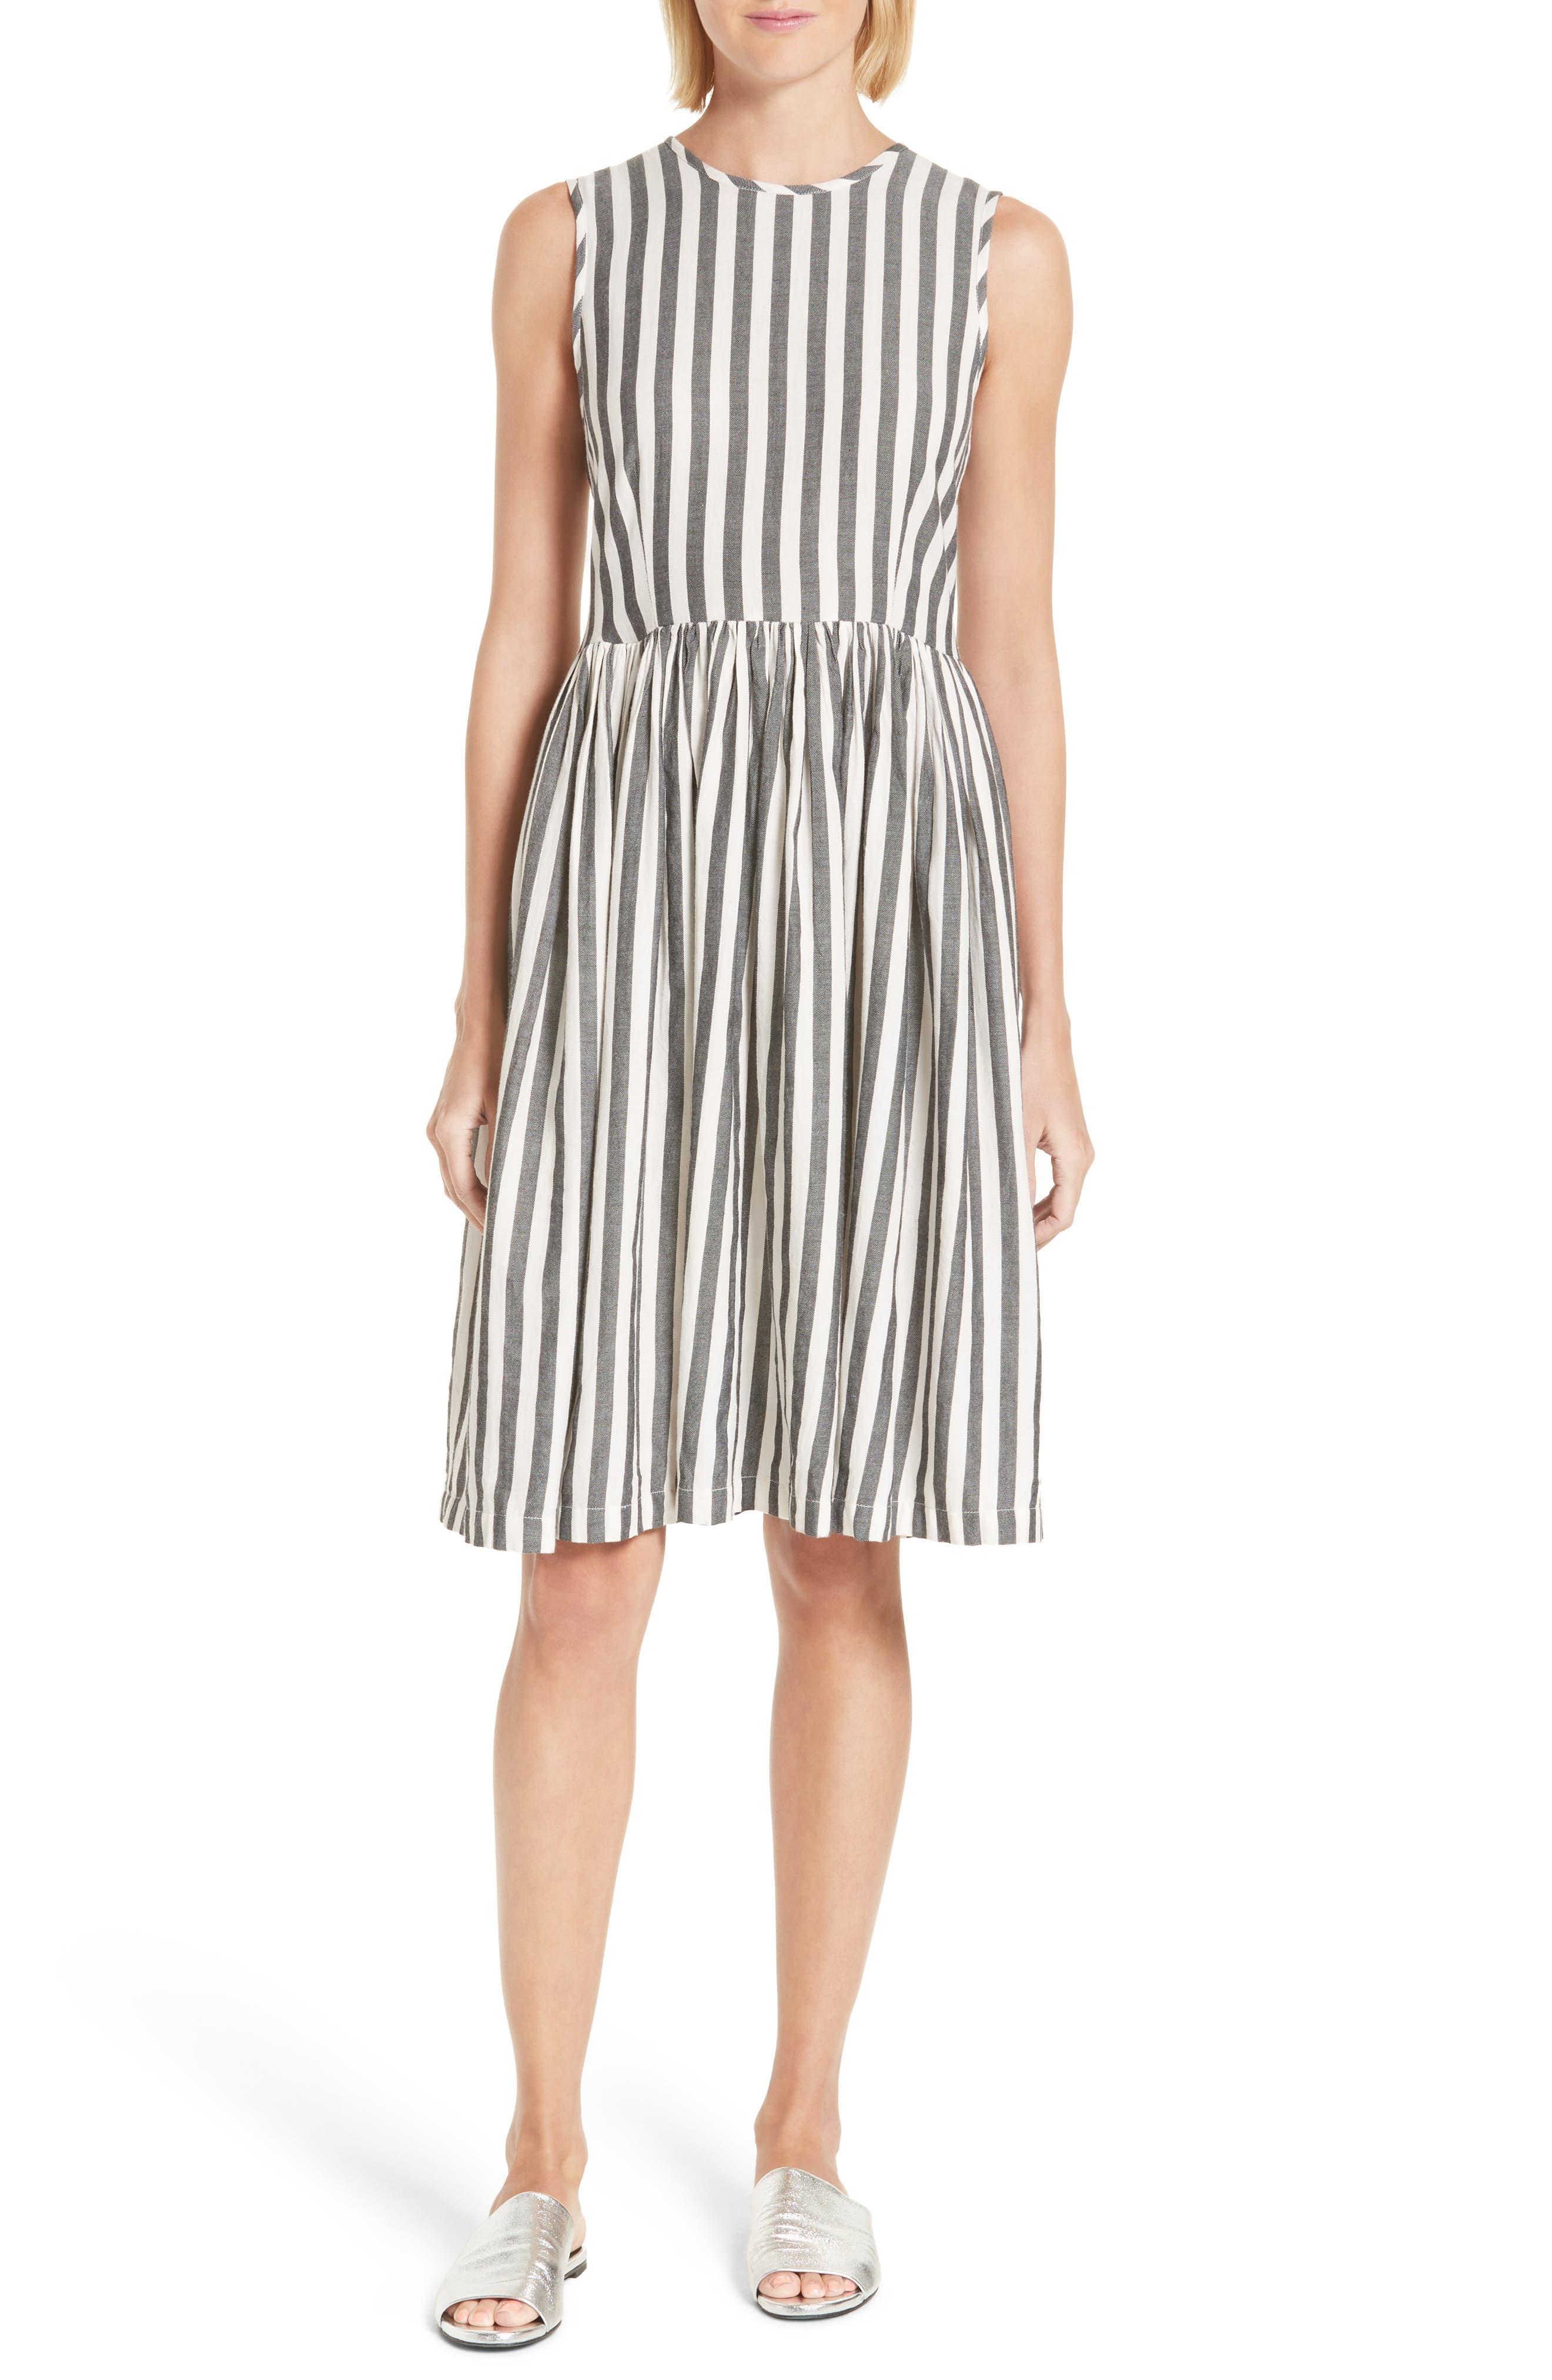 THE GREAT. The Prairie Stripe Dress